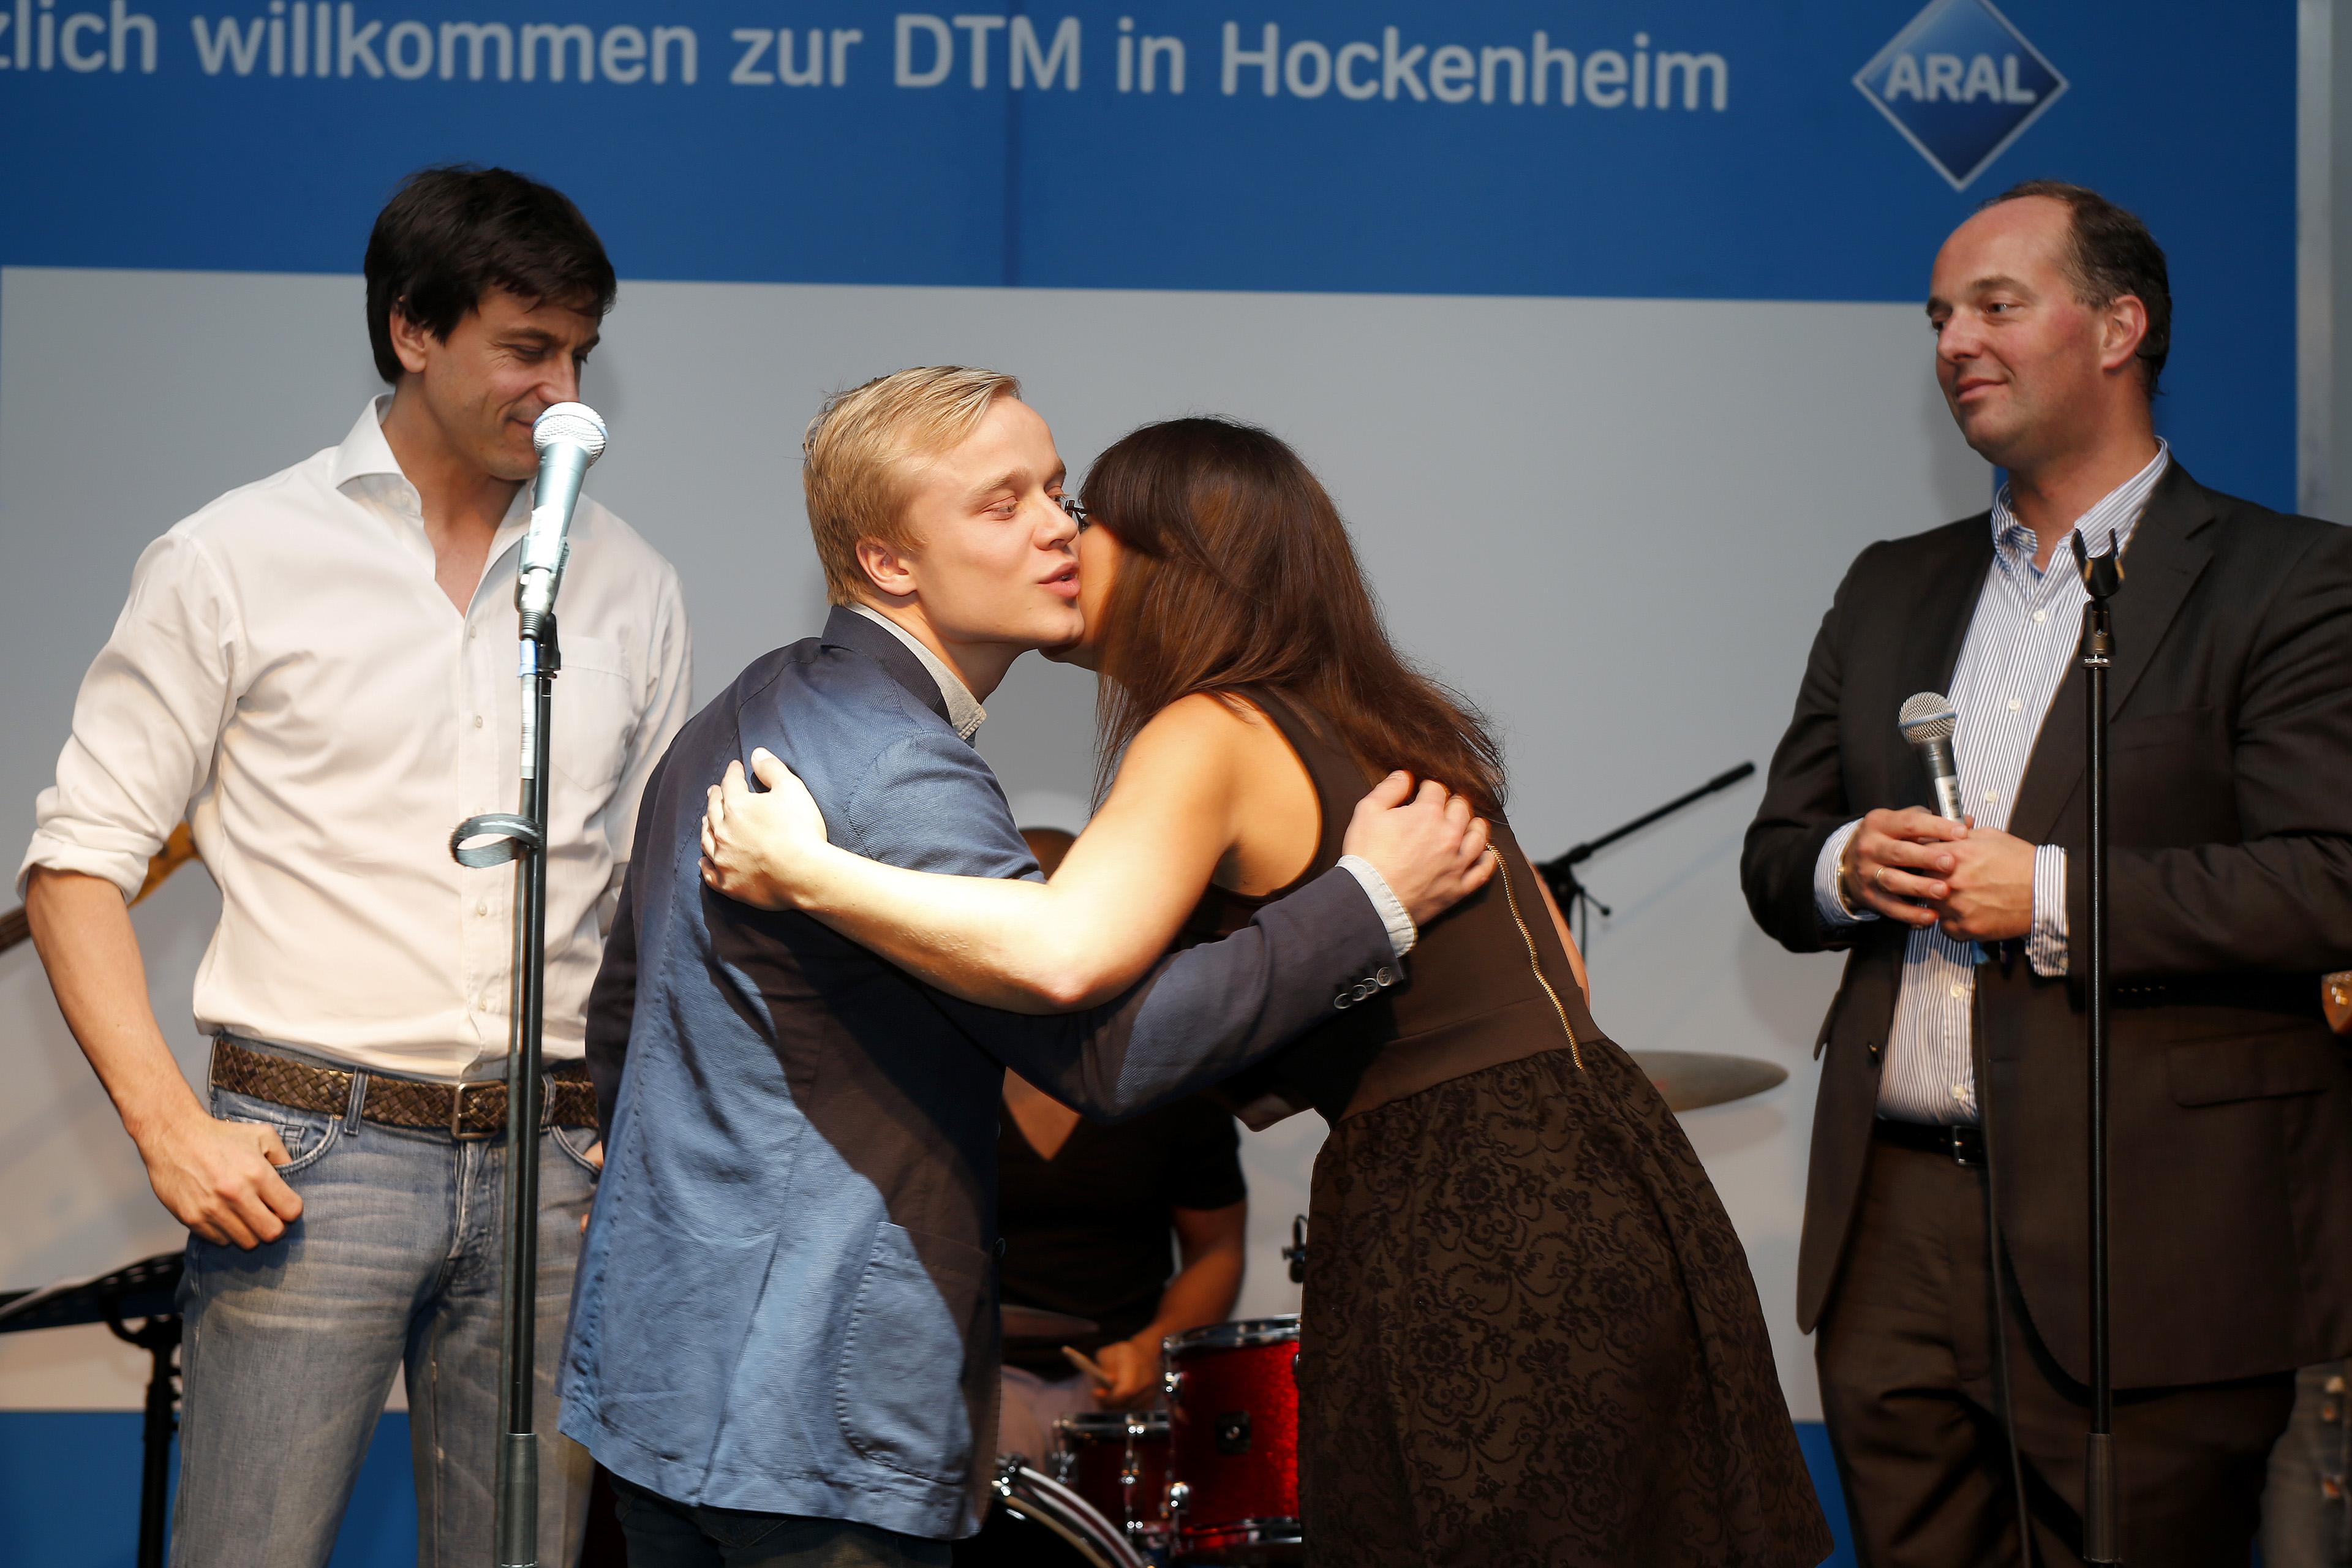 F3 European Championship 2013 - Prize Giving